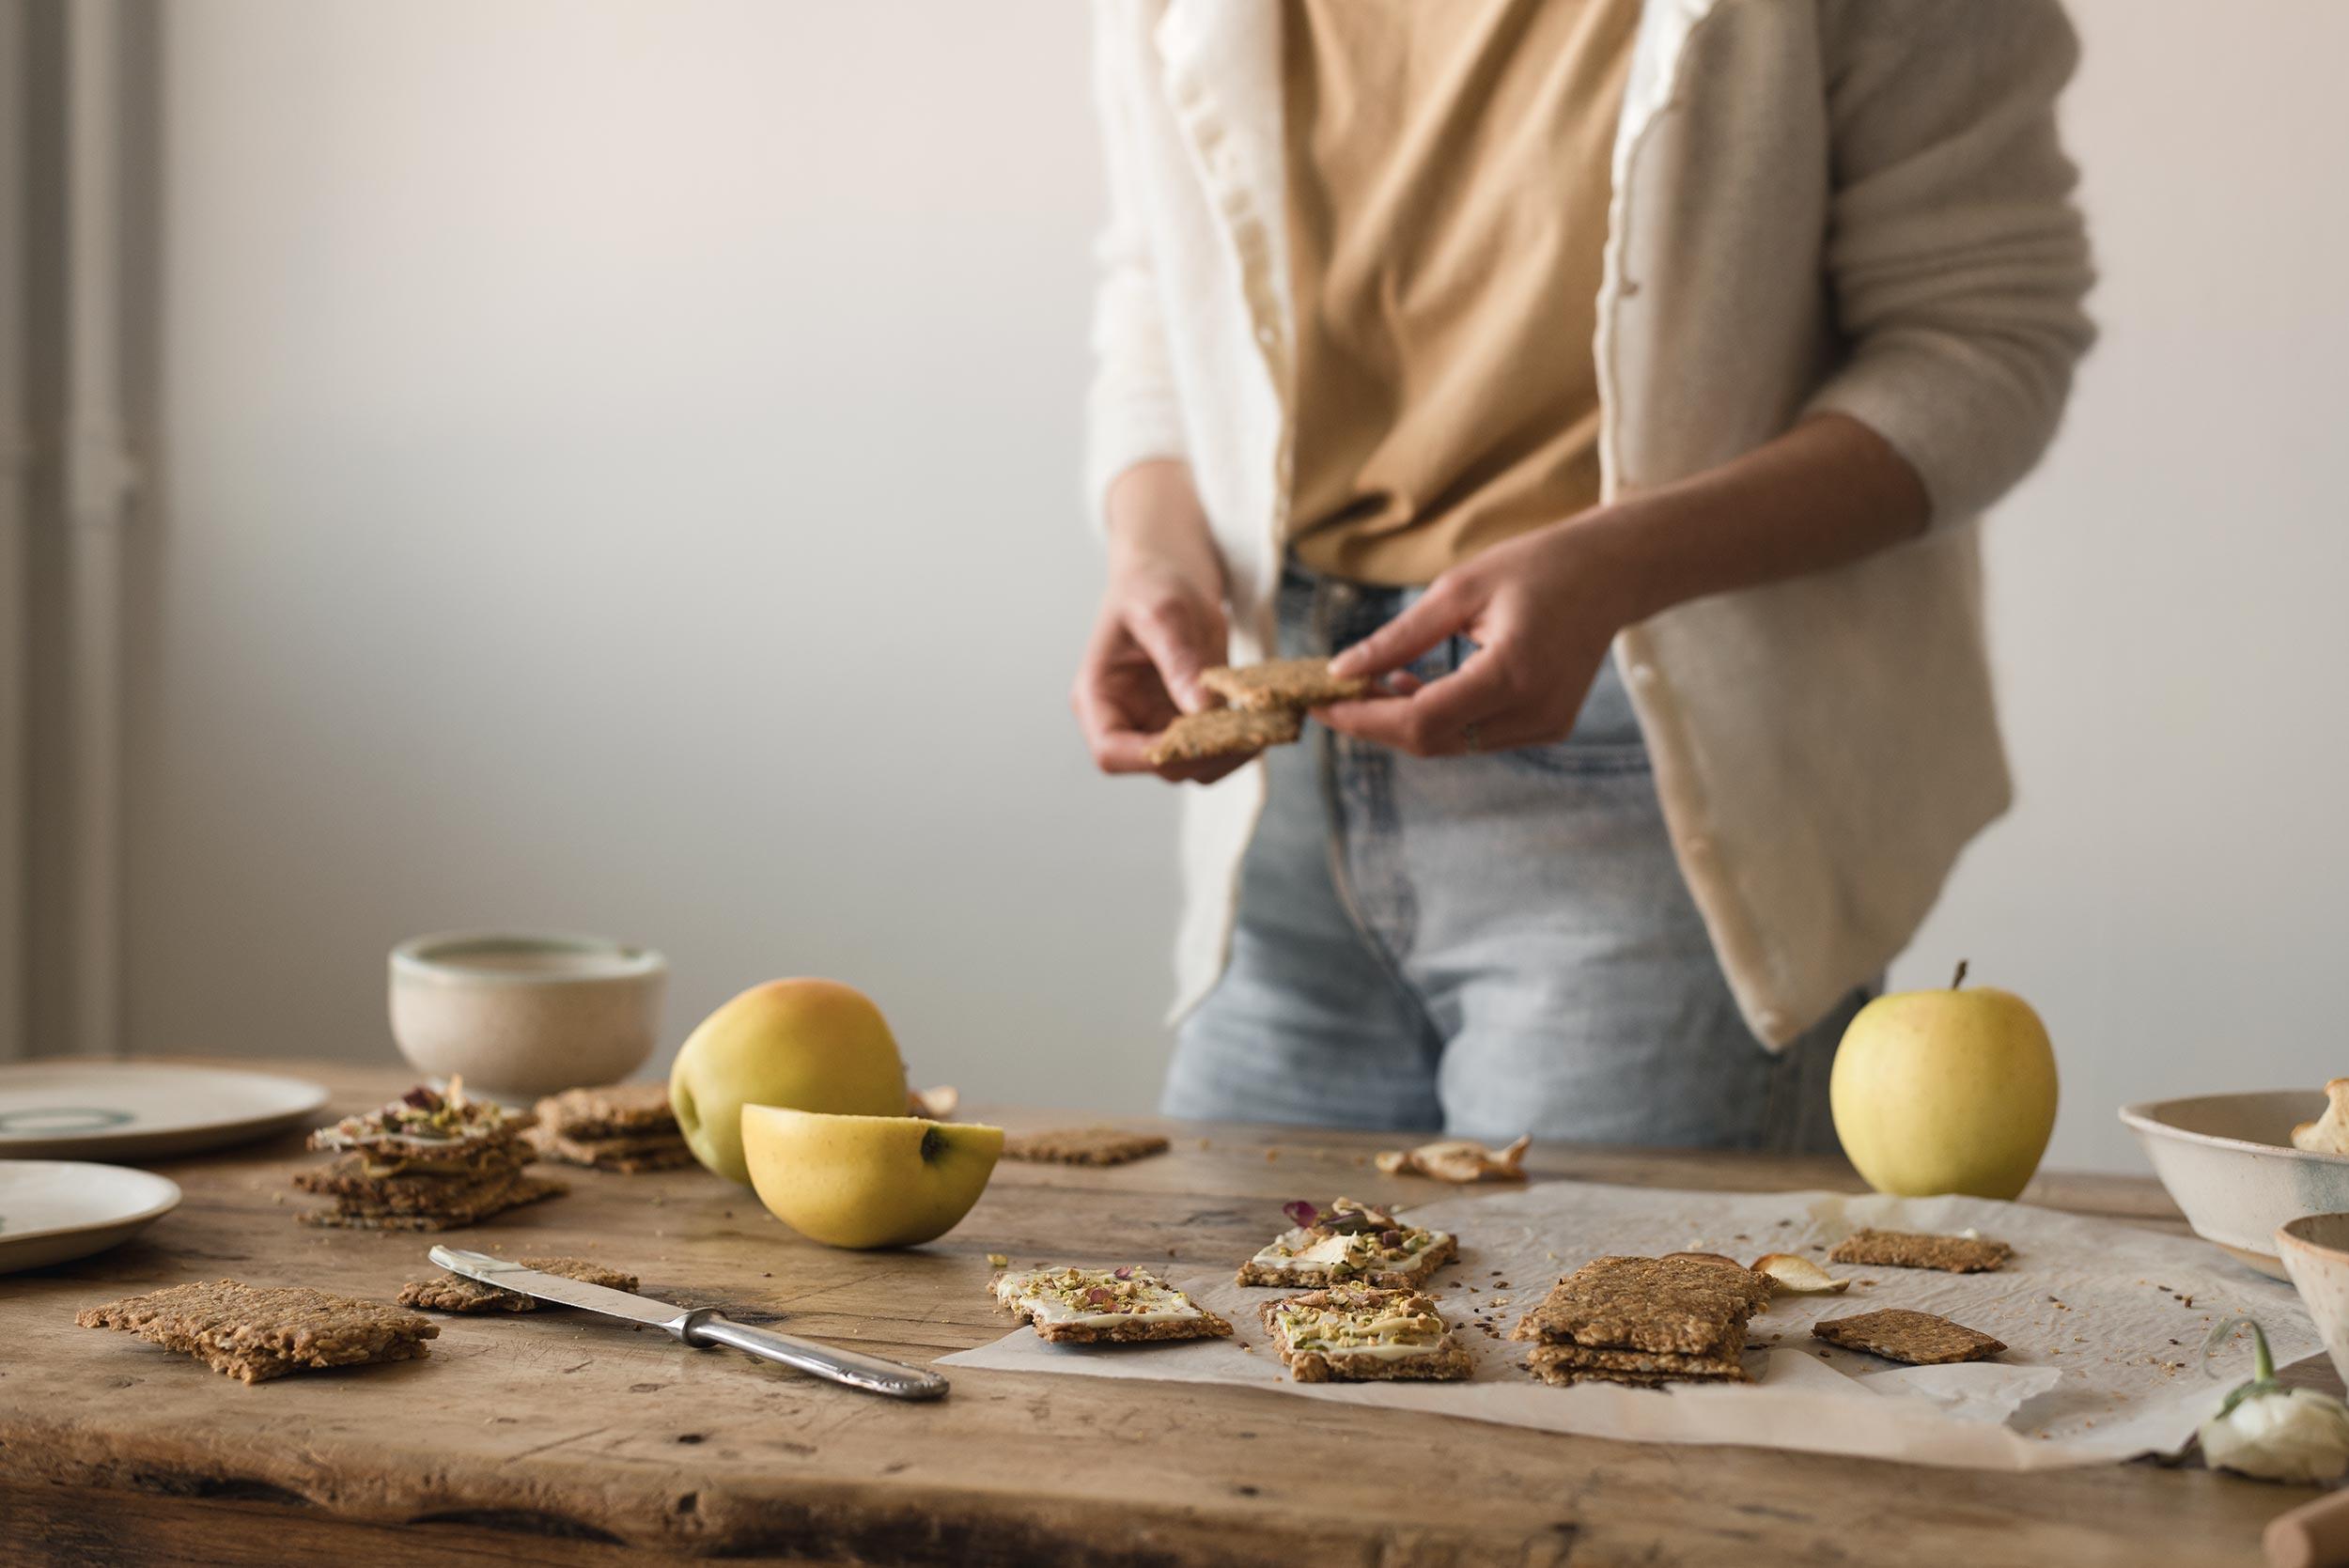 seeded apple cookies in the making